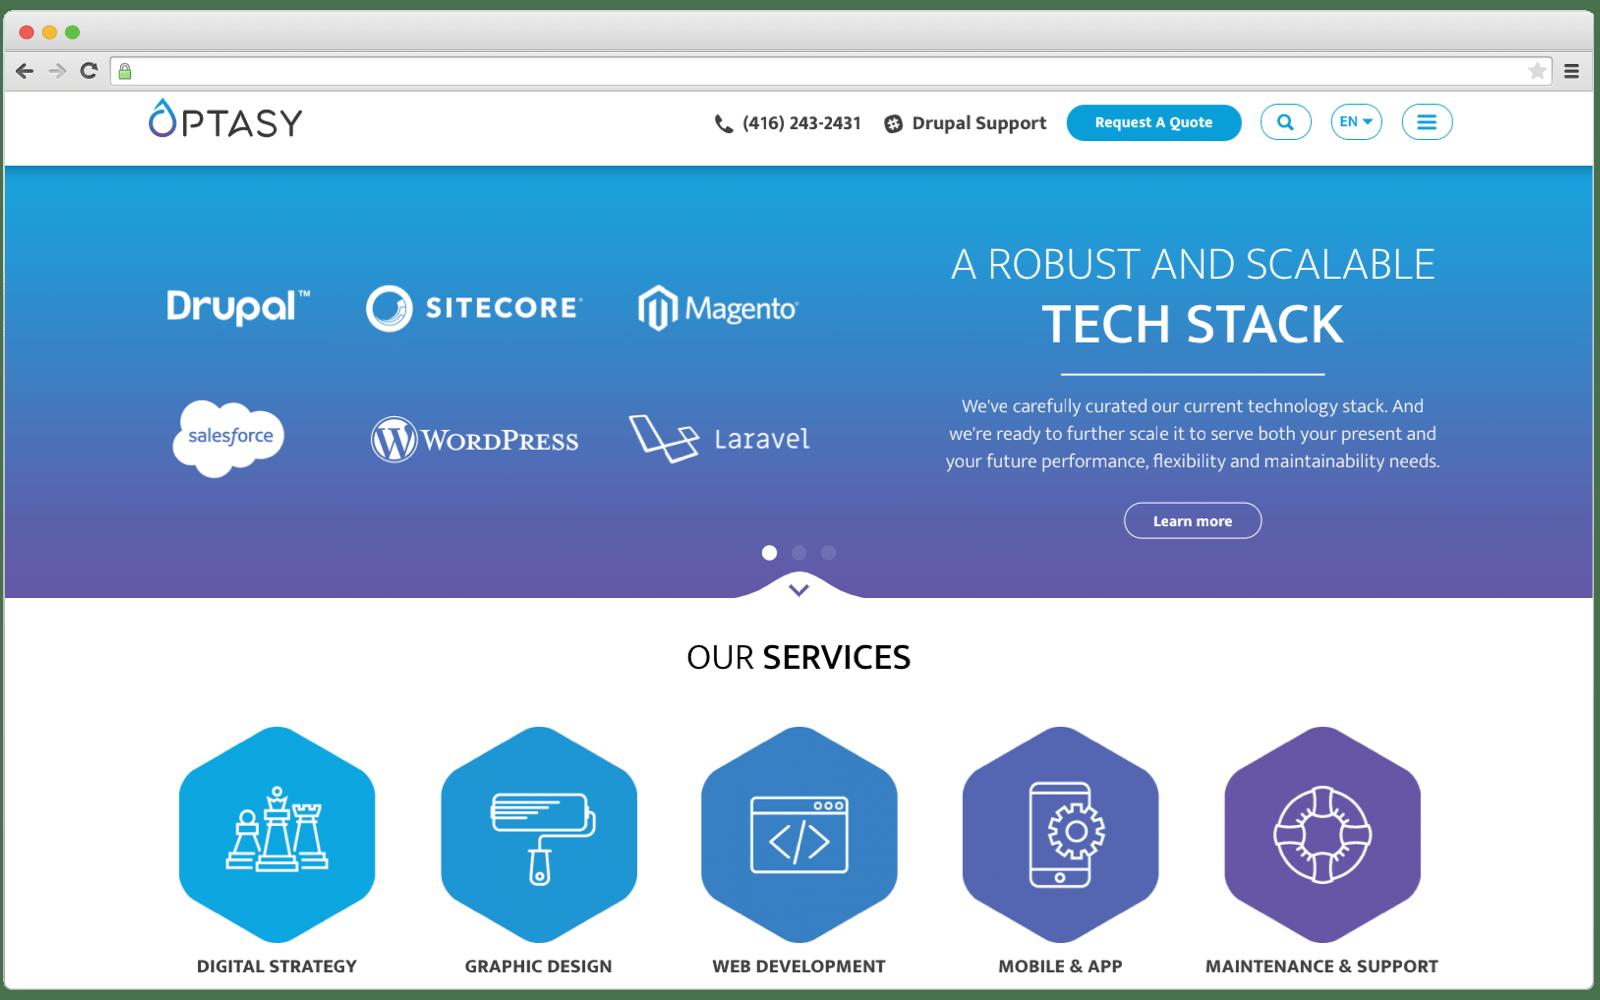 Top software development companies in Toronto: OPTASY